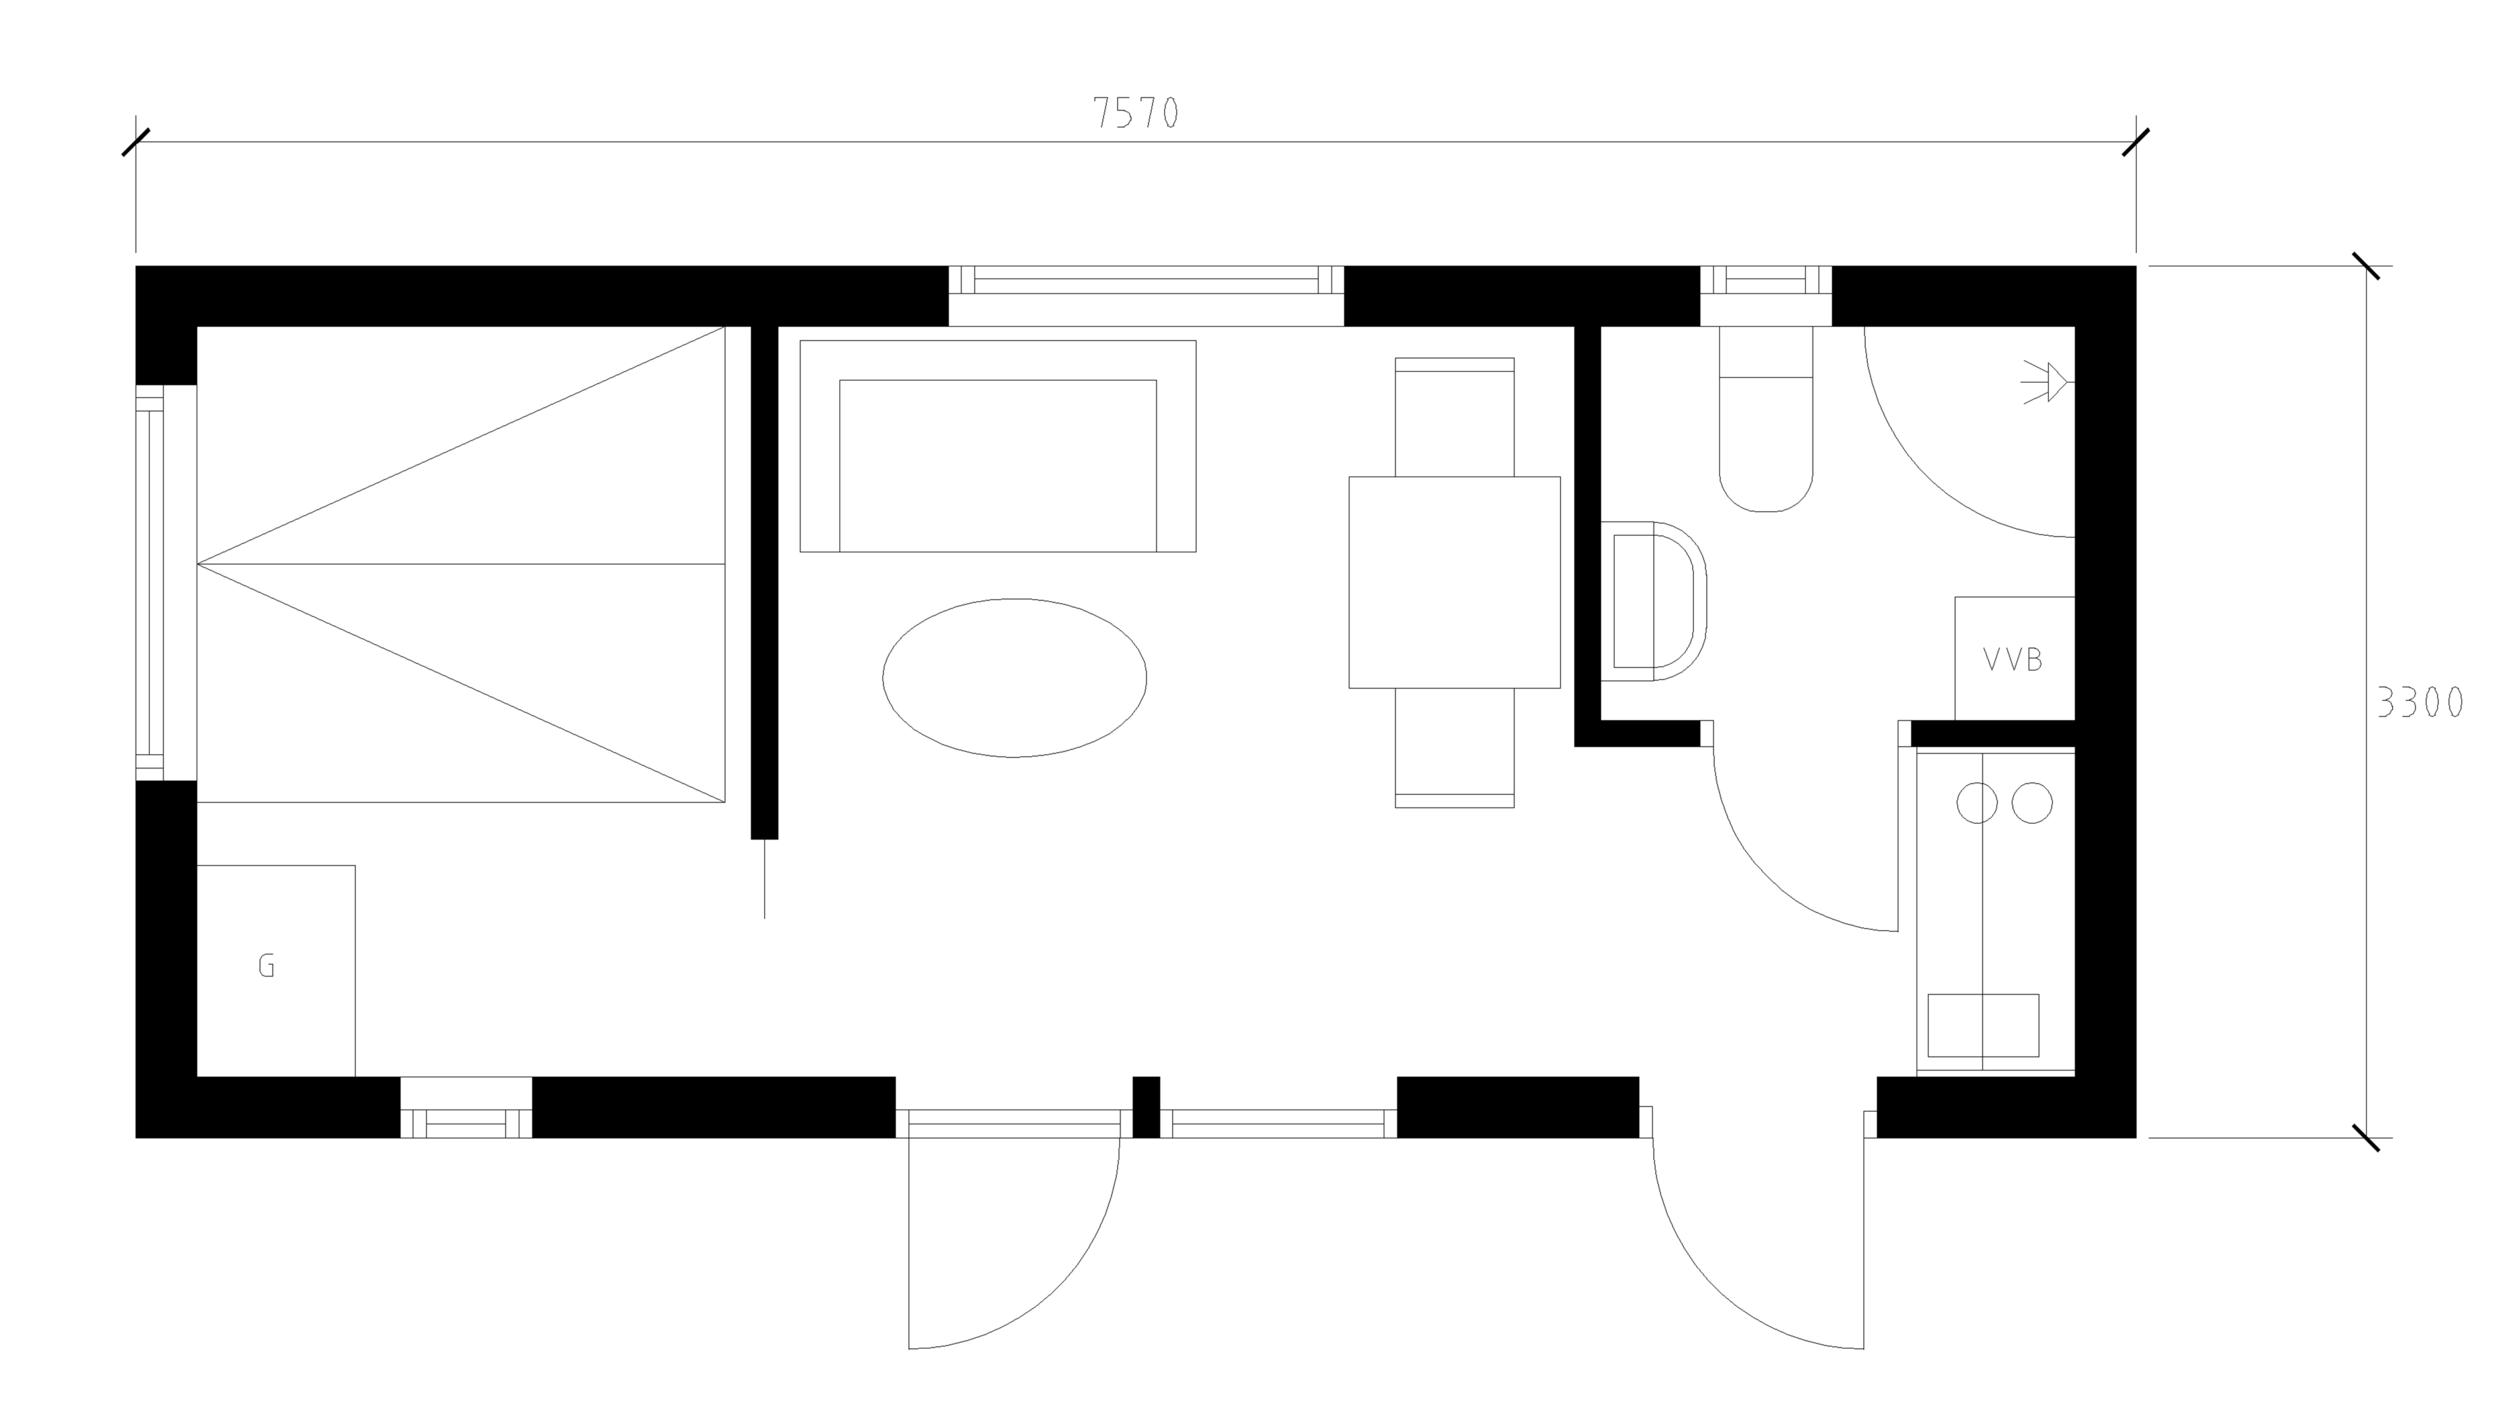 easy-house-attefallshus-åhus-25-med-sovrum-badrum-kök-planlösning-2